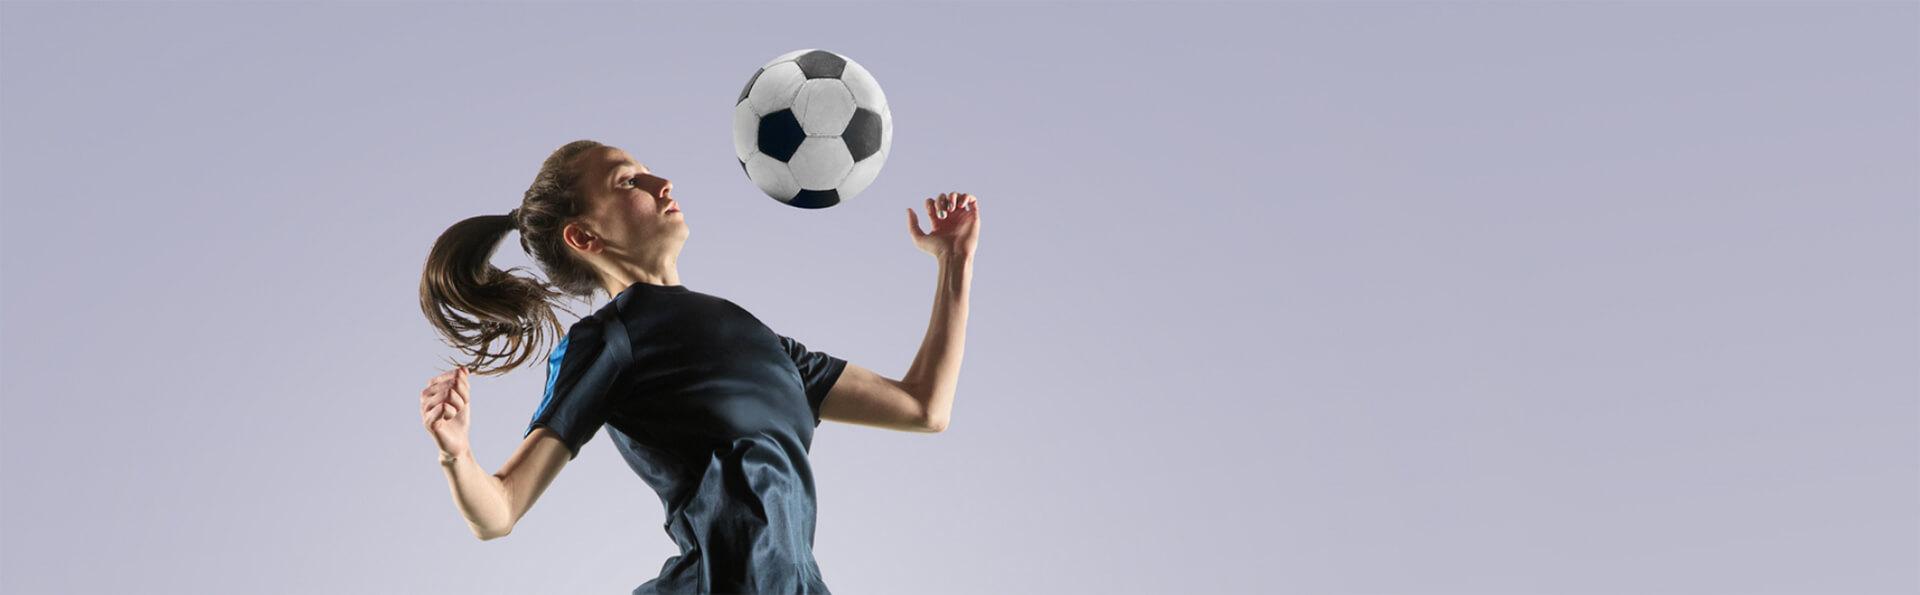 Rêve de sportifs - Notre accompagnement